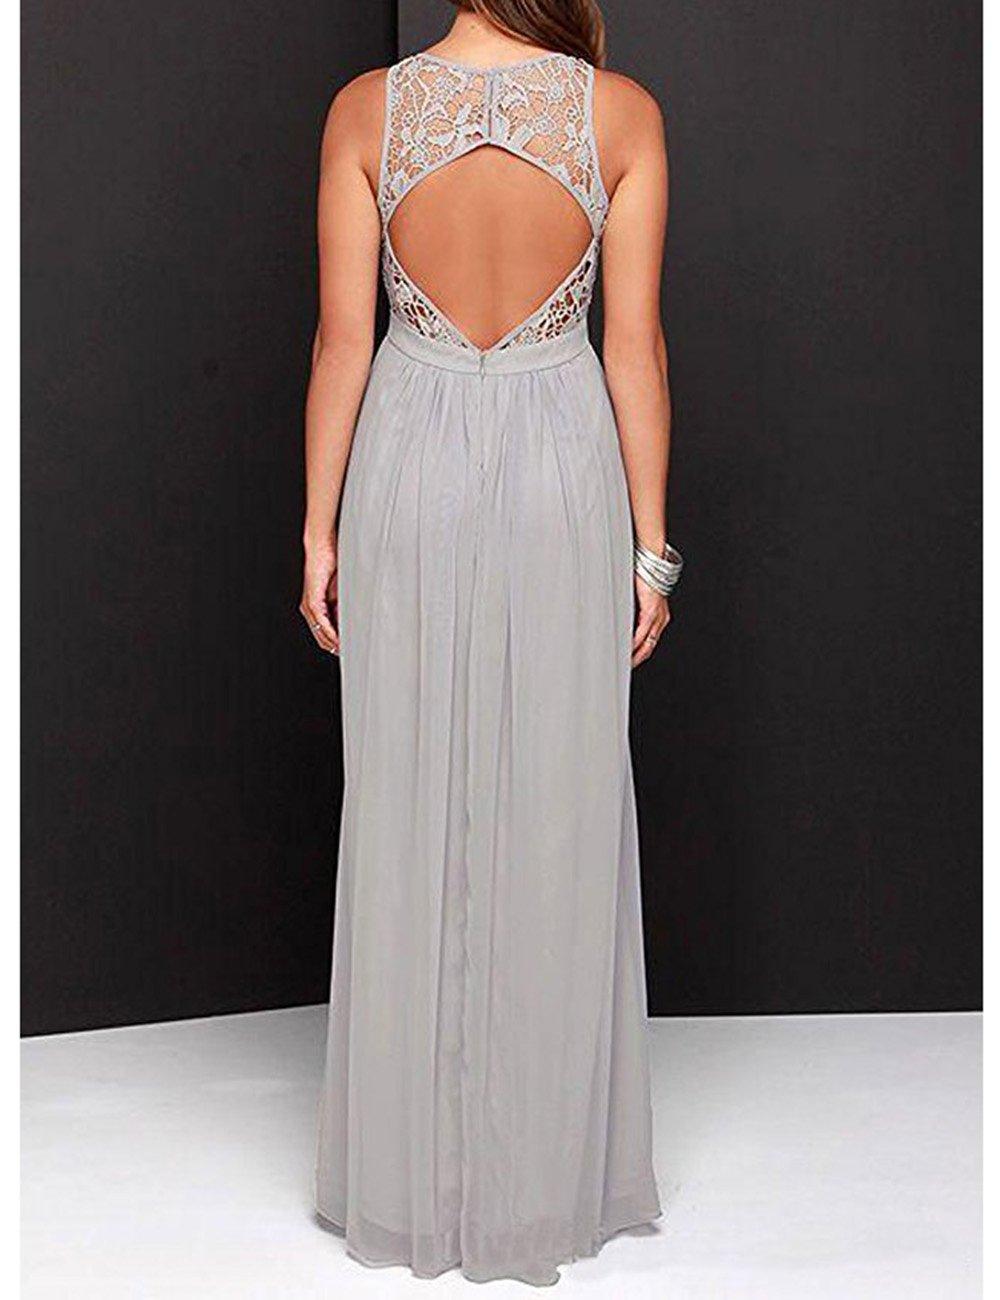 Amazon.com: Beautydress Vintage Long Chiffon Lace Bridesmaid Dress Women BP105: Clothing